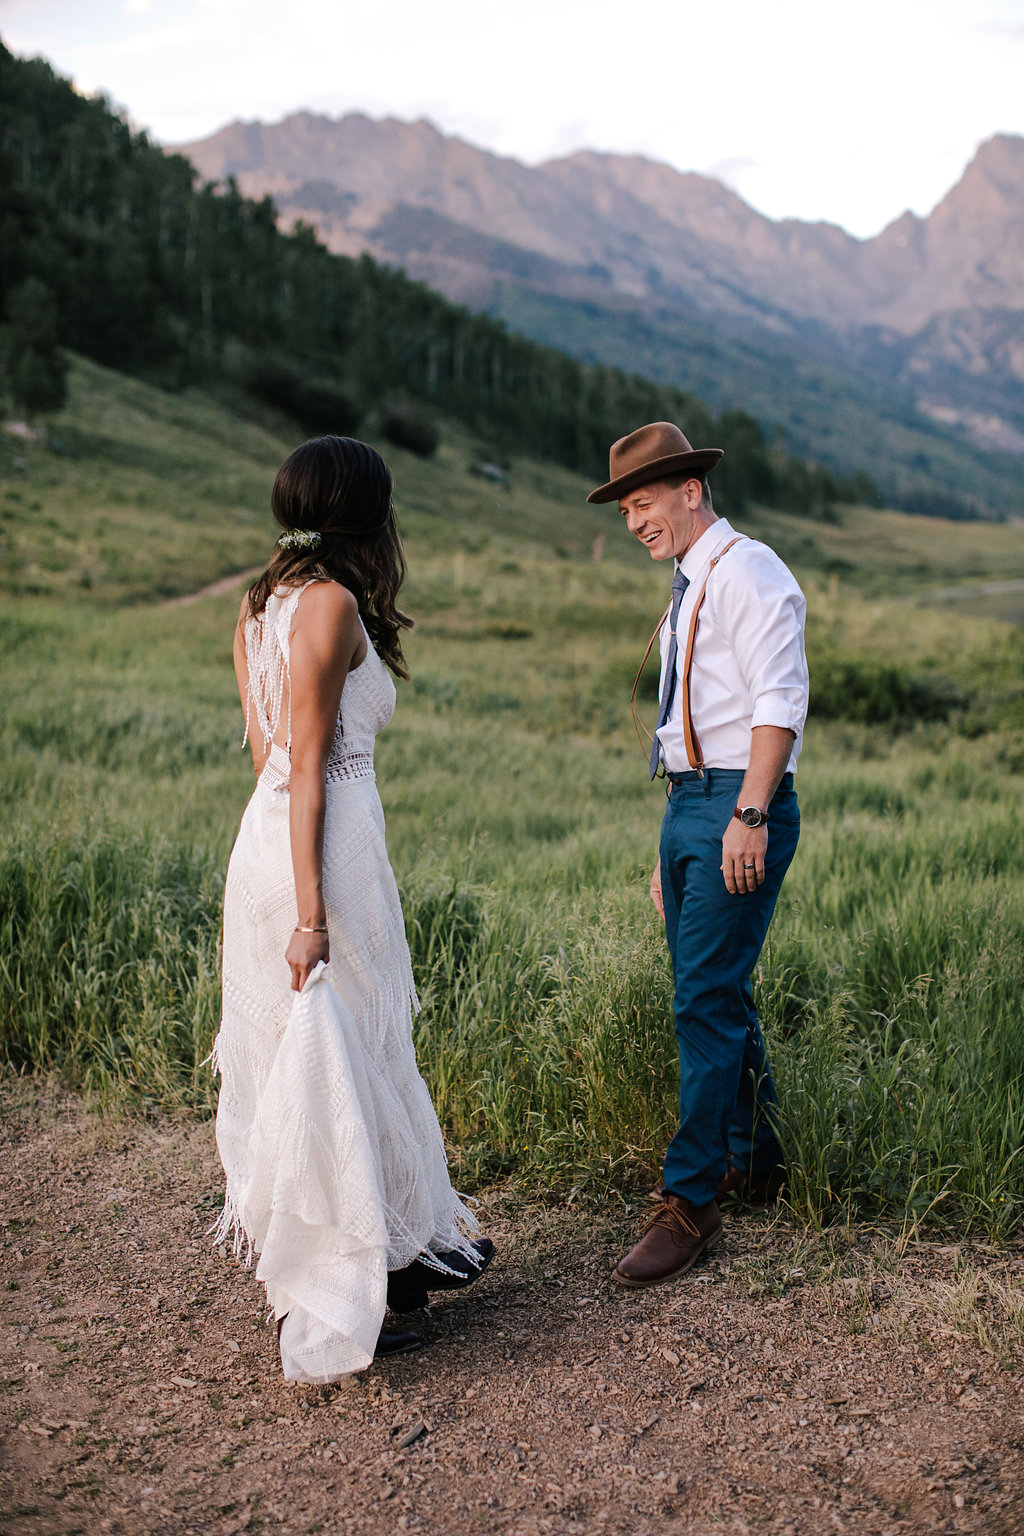 kellylemonphotography_kyle+olivia_weddingsneakpeeks-10.jpg